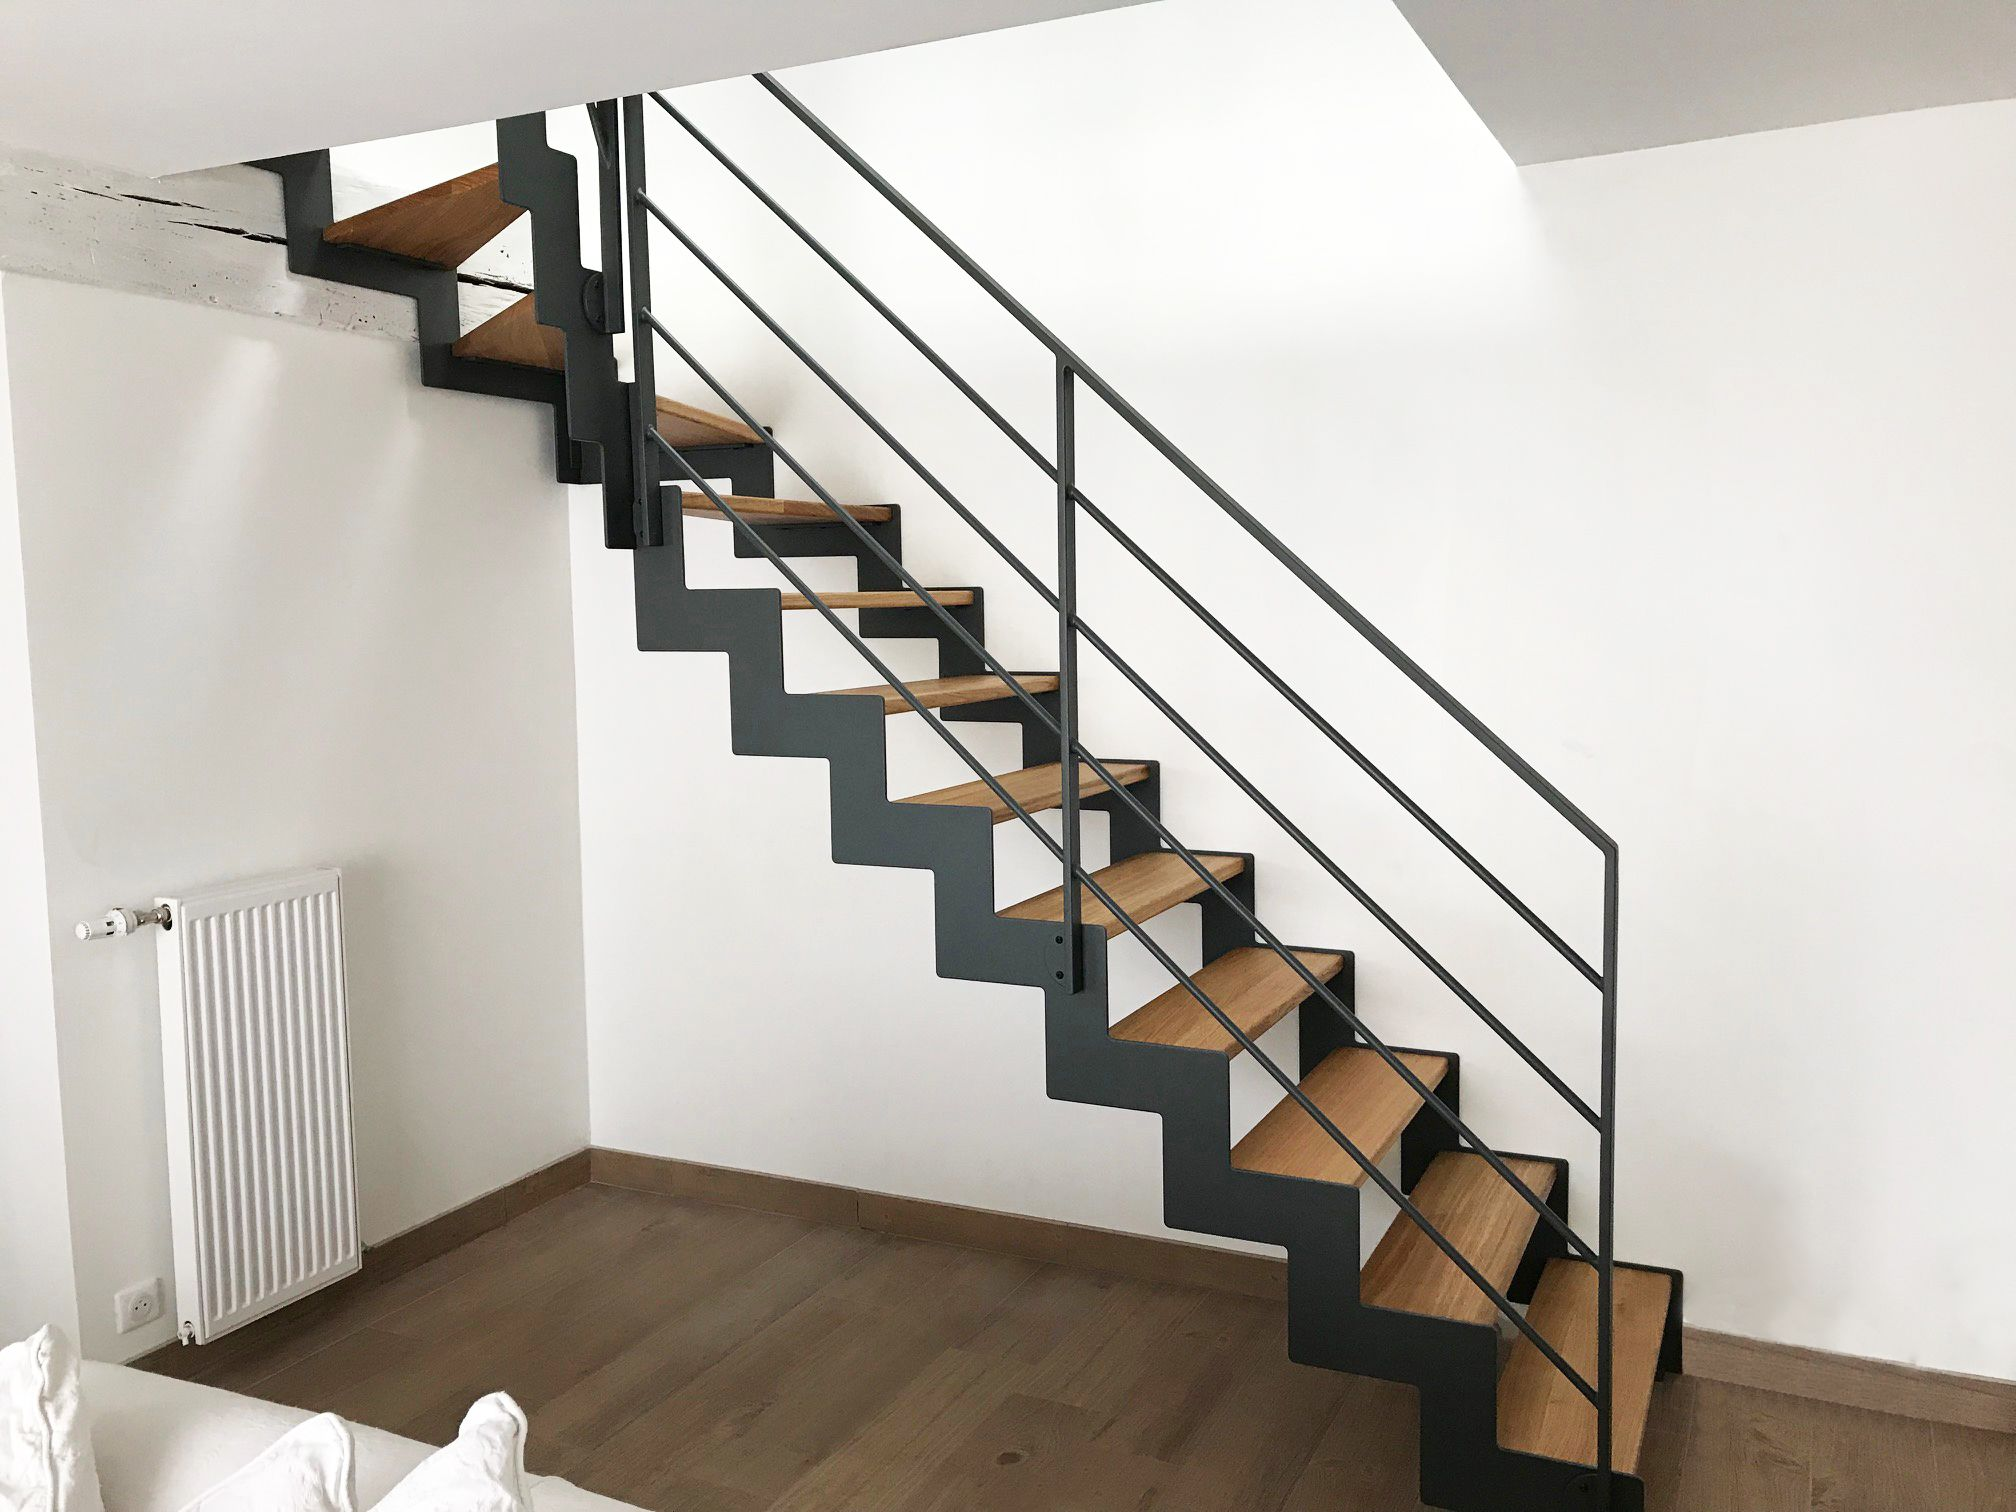 Garde Corps Haut Escalier Épinglé par robert sedillo sur metal art en 2020 | escalier